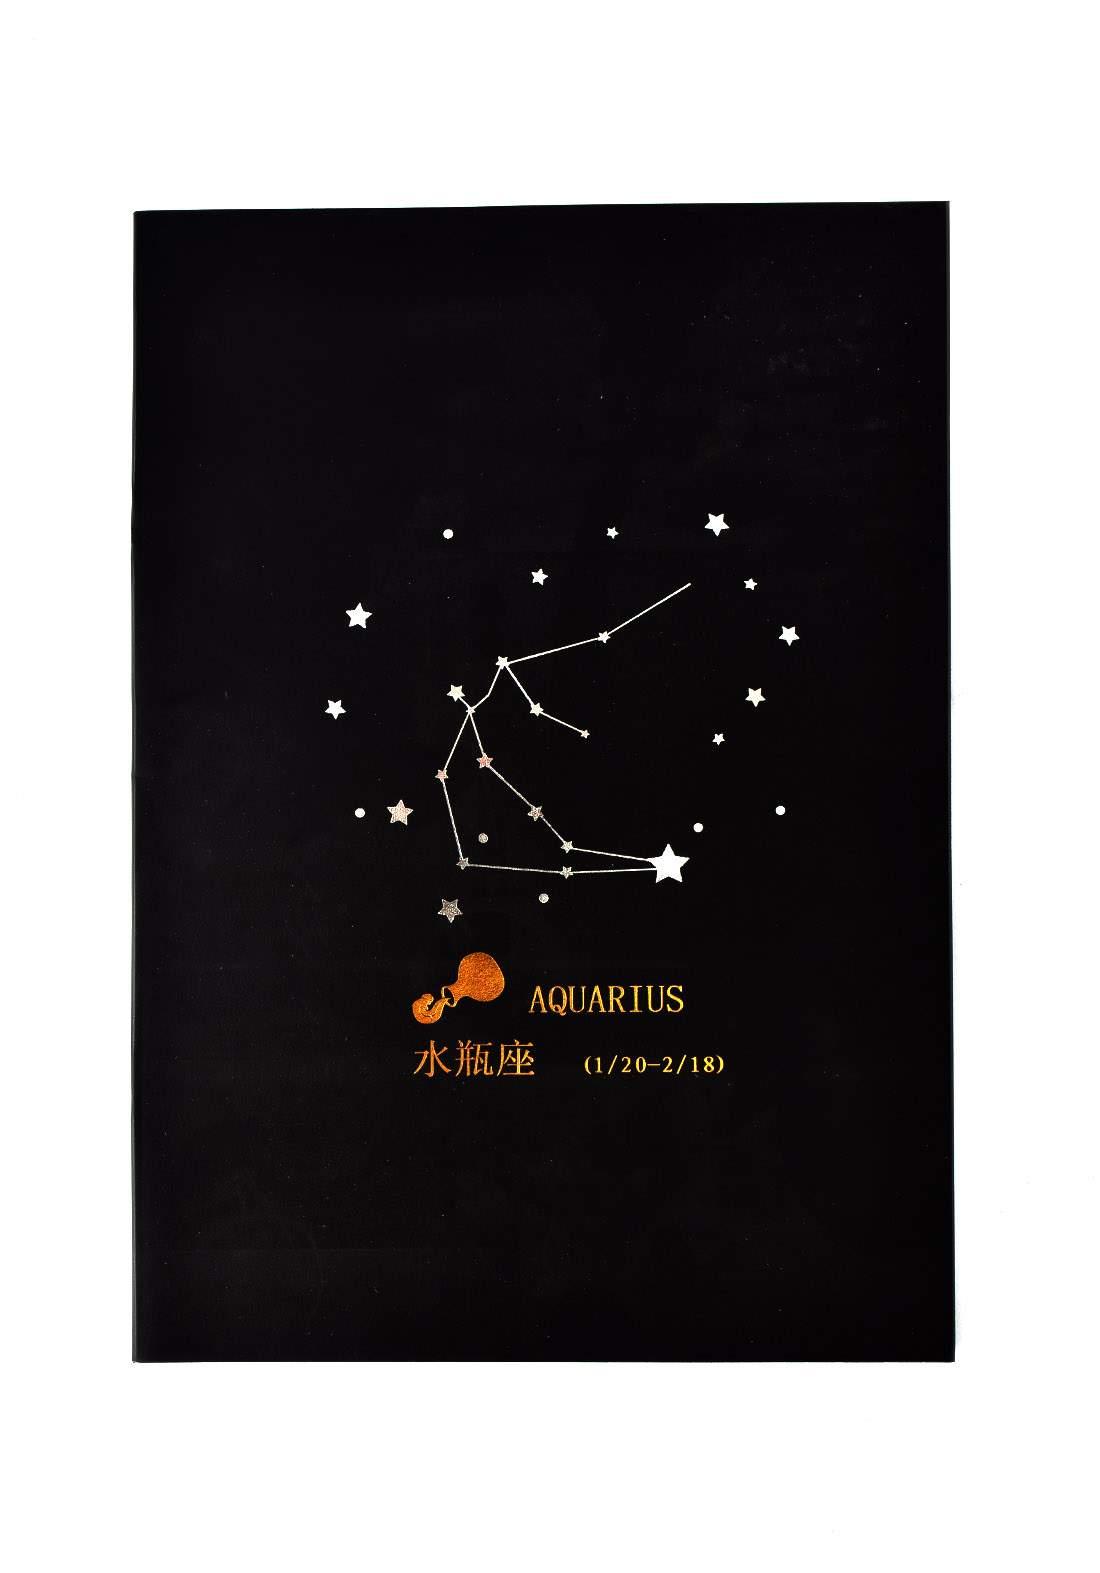 Big Black Drawing Book 24 Sheets-Aquarius دفتر رسم اسود كبير بطبعة برج الدلو